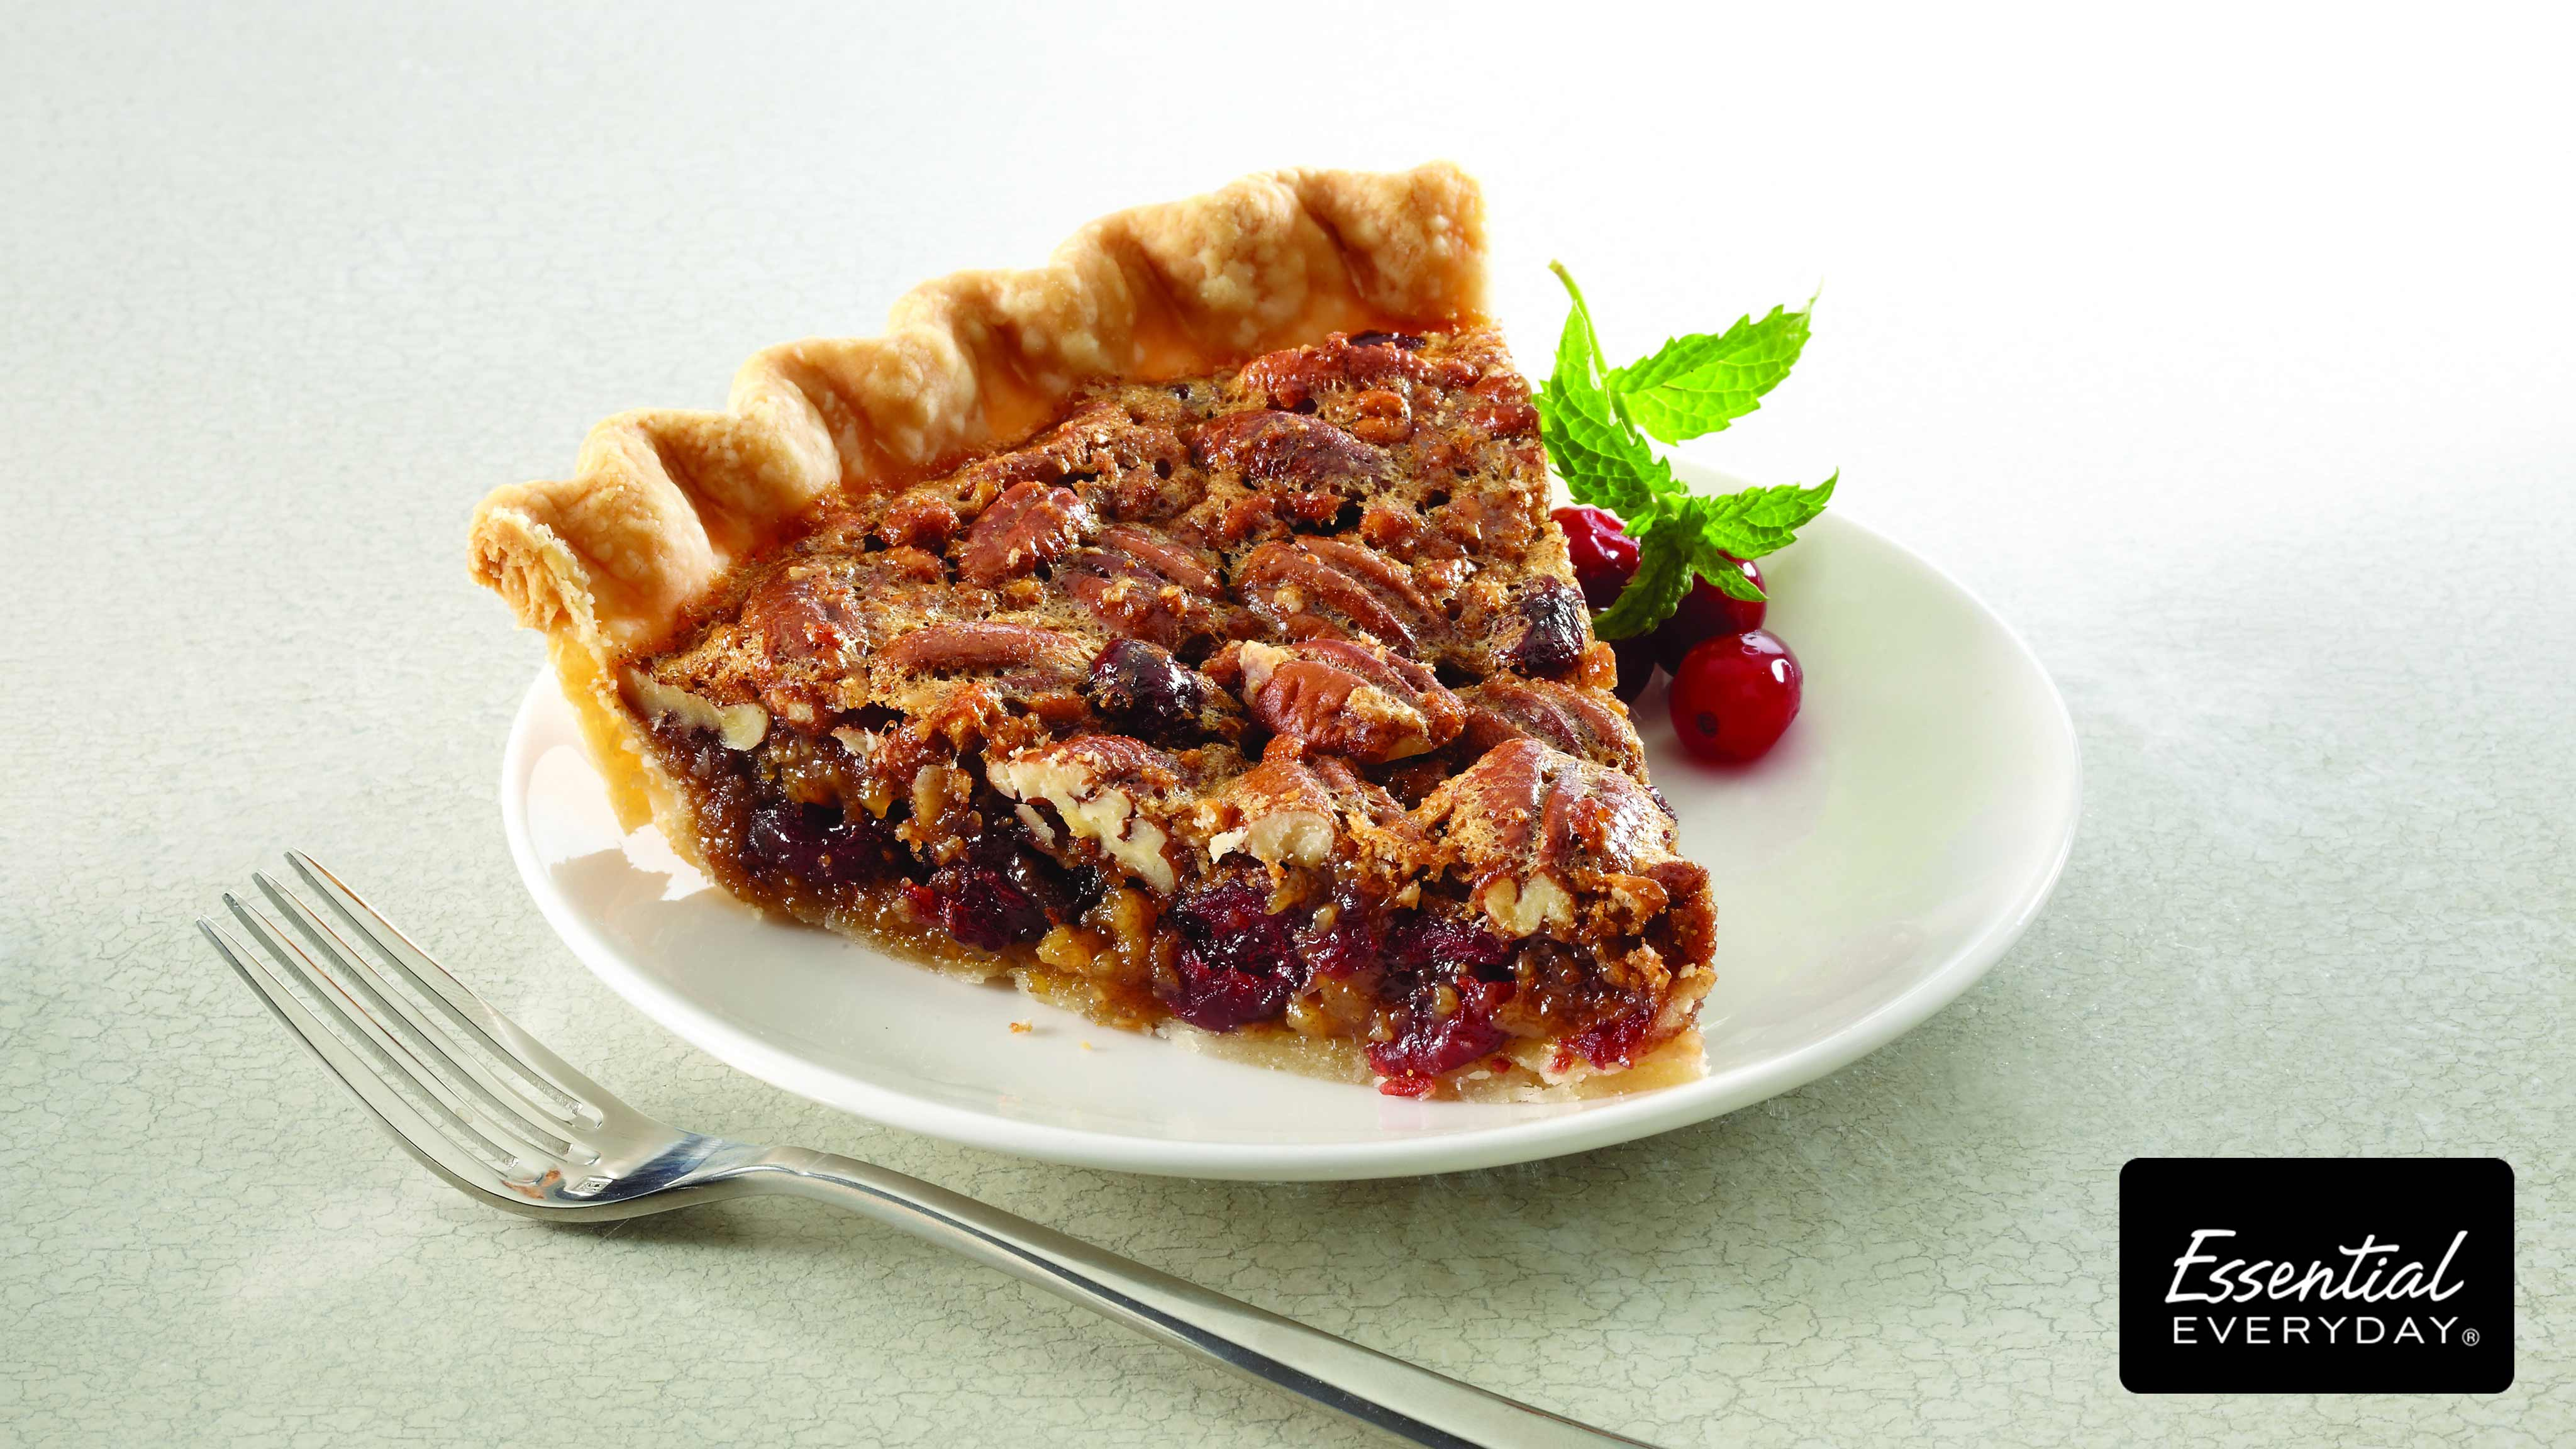 Image for Recipe Cranberry Pecan Pie